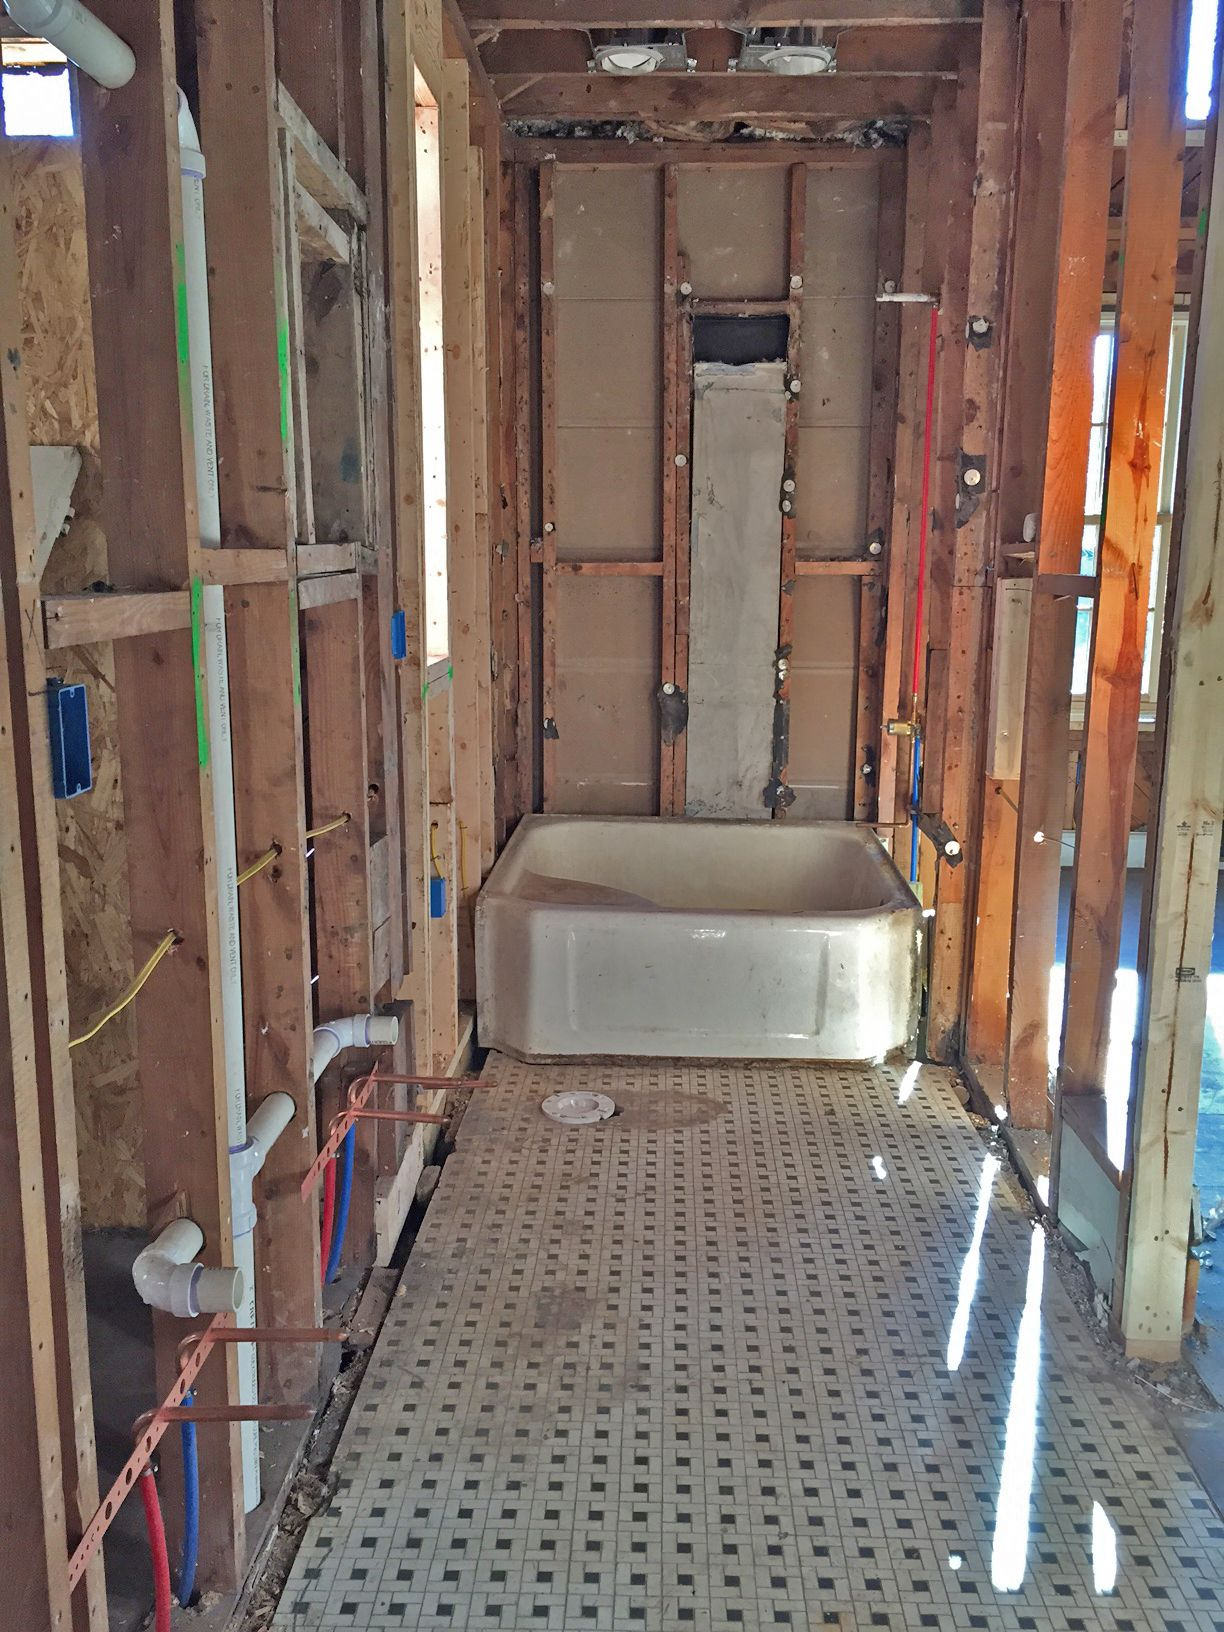 Bathroom Plumbing Diagram Concrete Slab 6 Pin Cdi Unit Wiring Trends 2017 2018 Batrom